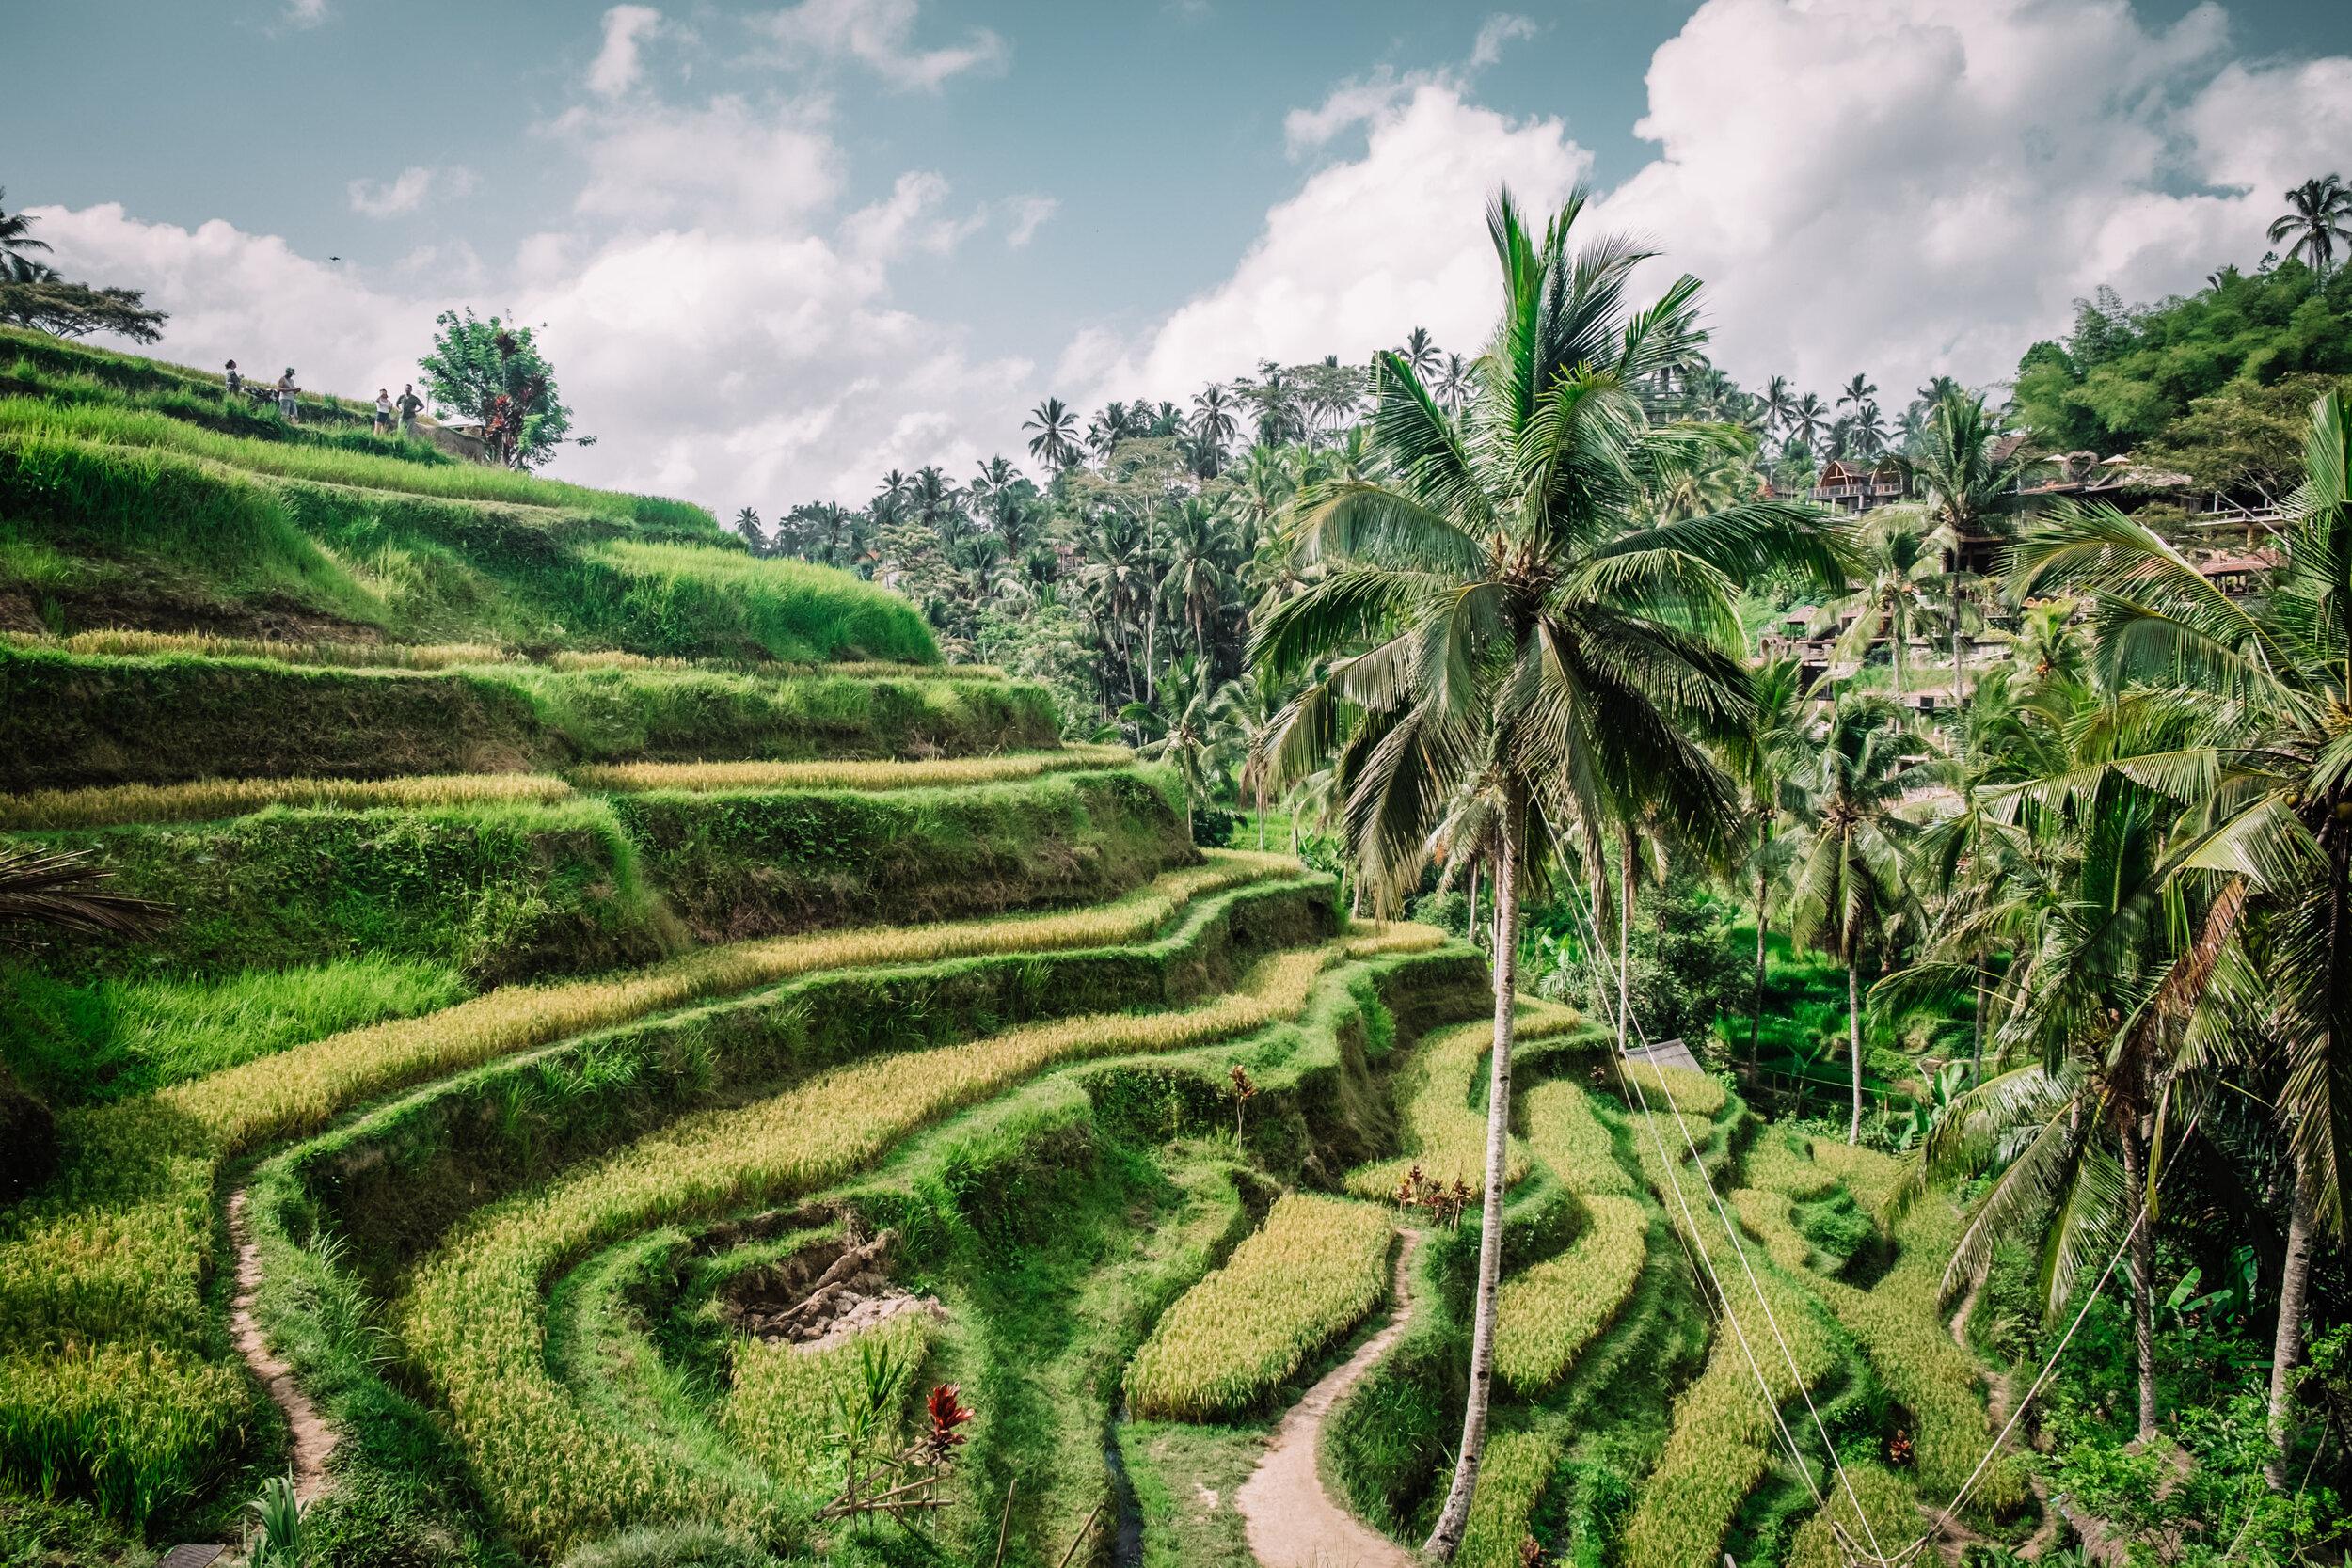 Rachel Off Duty: Tegalalang Rice Terraces in Bali